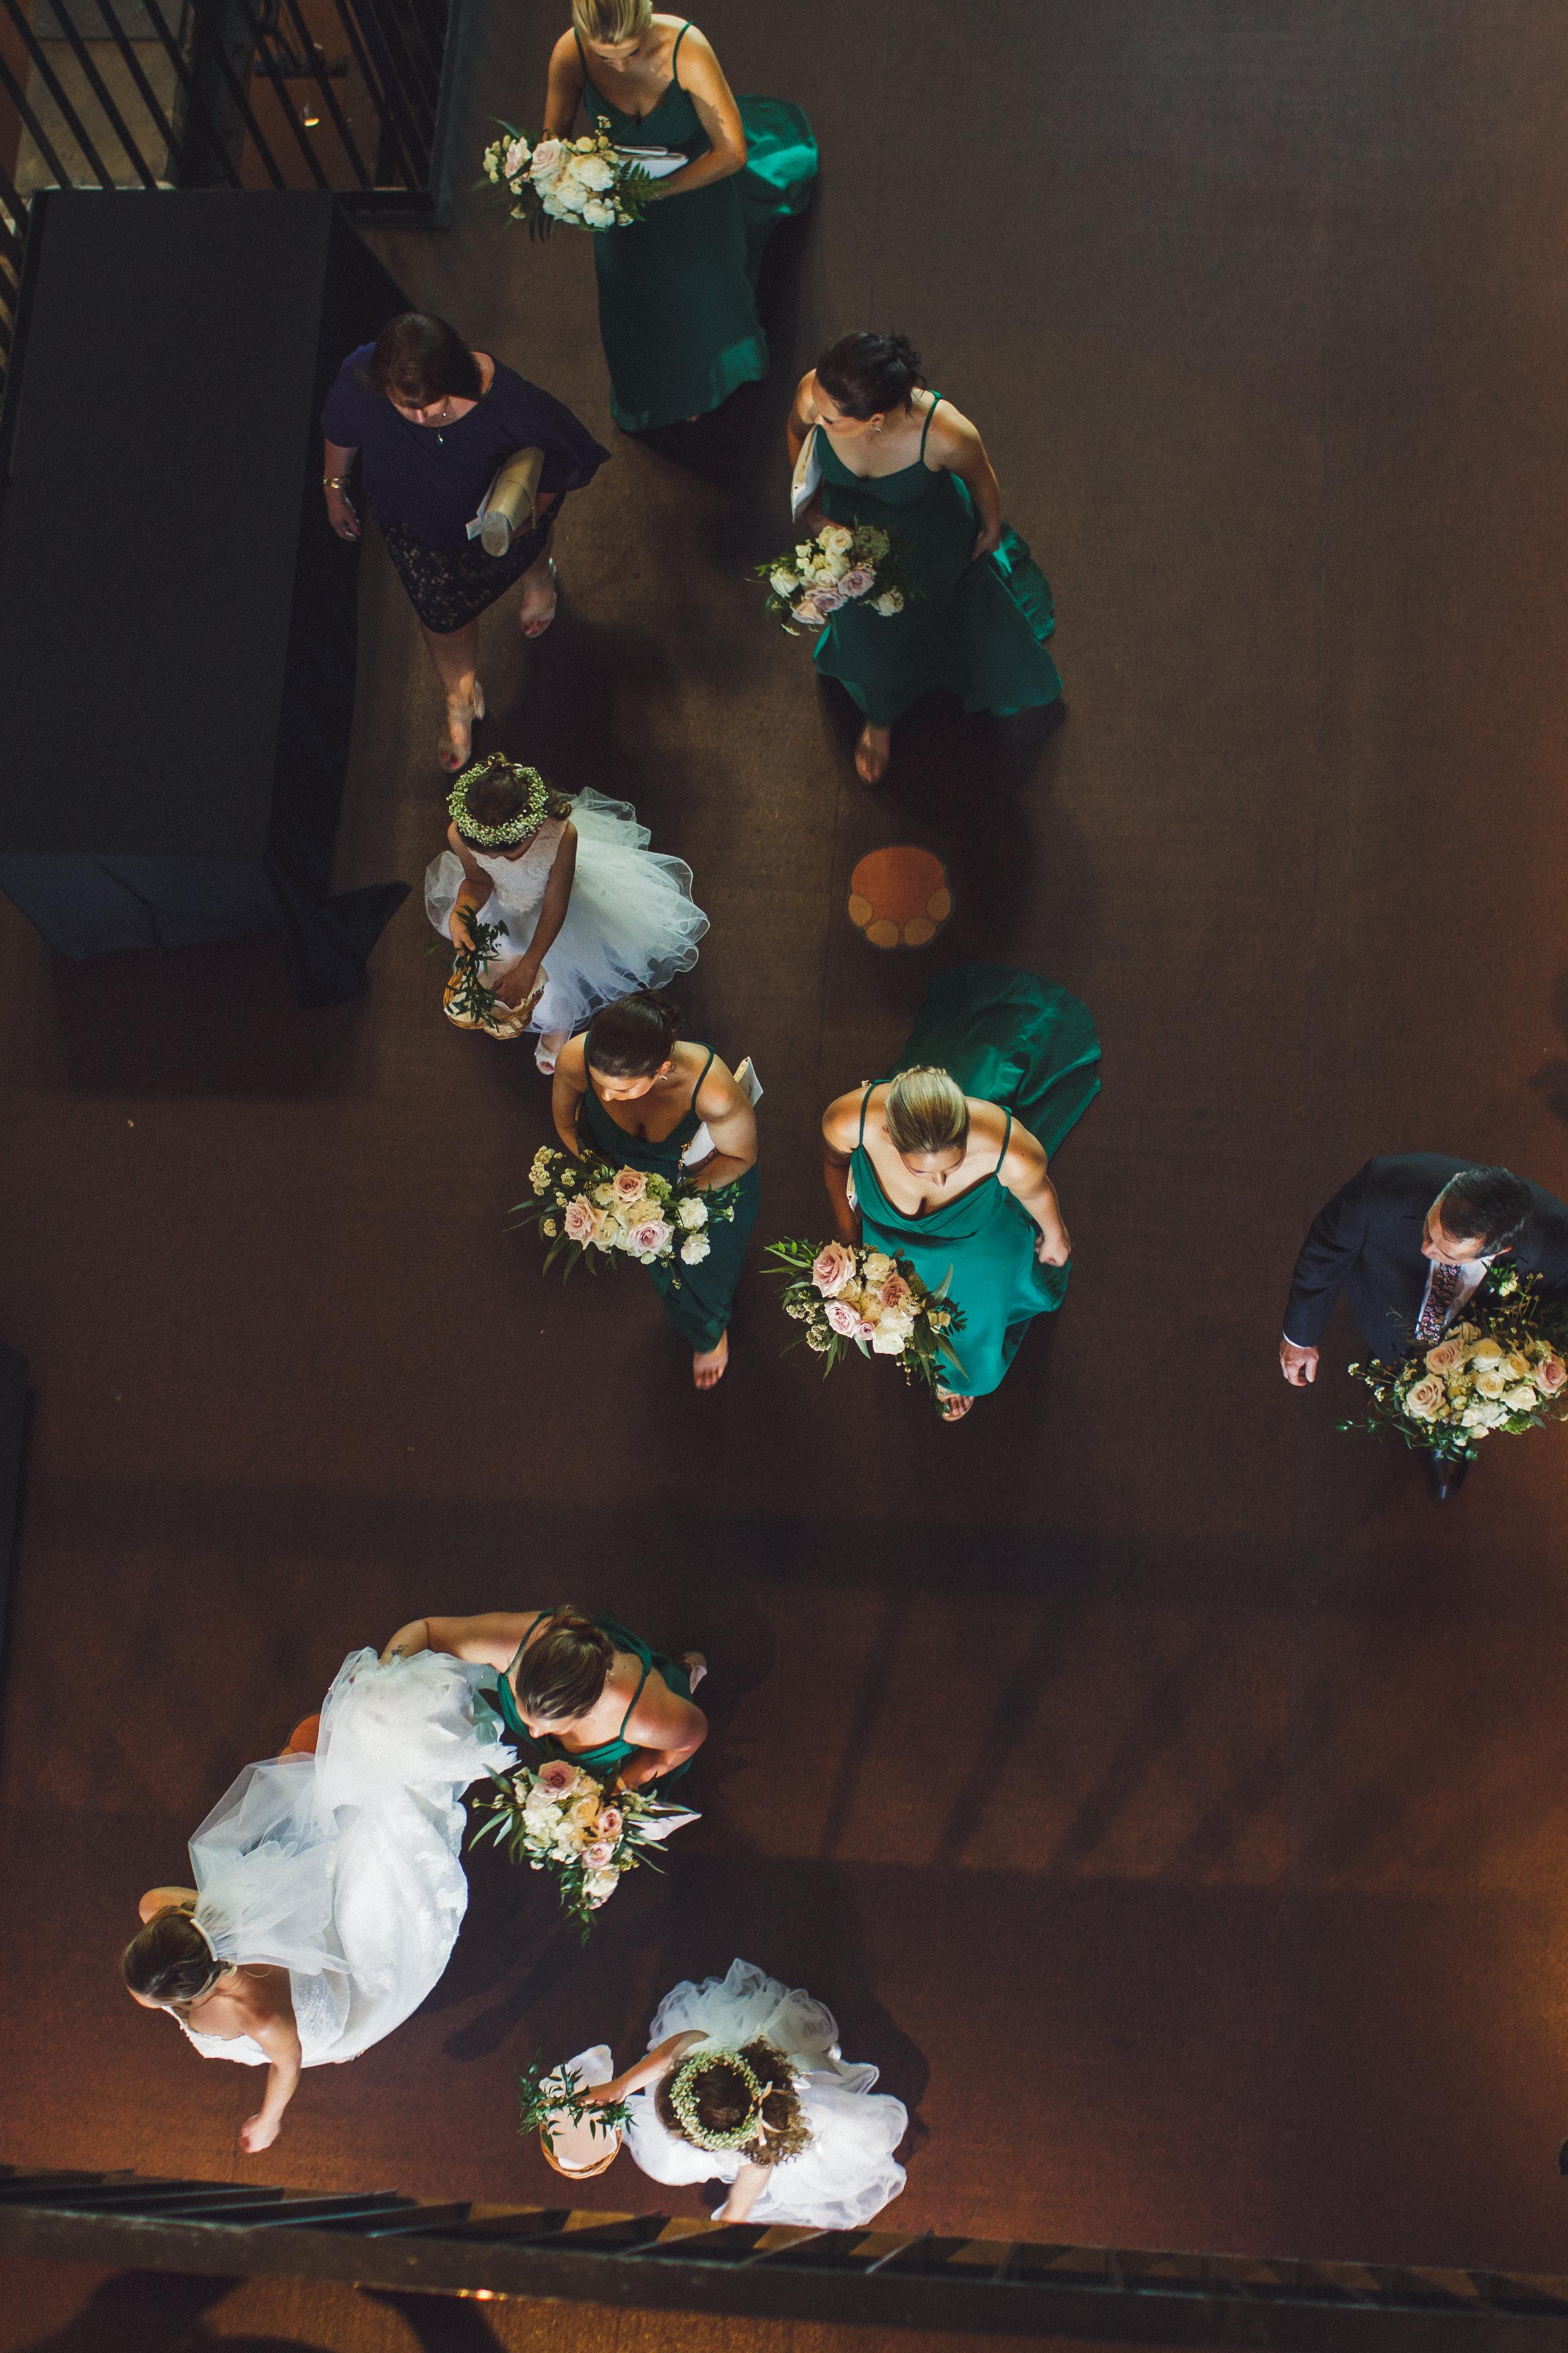 lightspace-brisbane-wedding-013.JPG